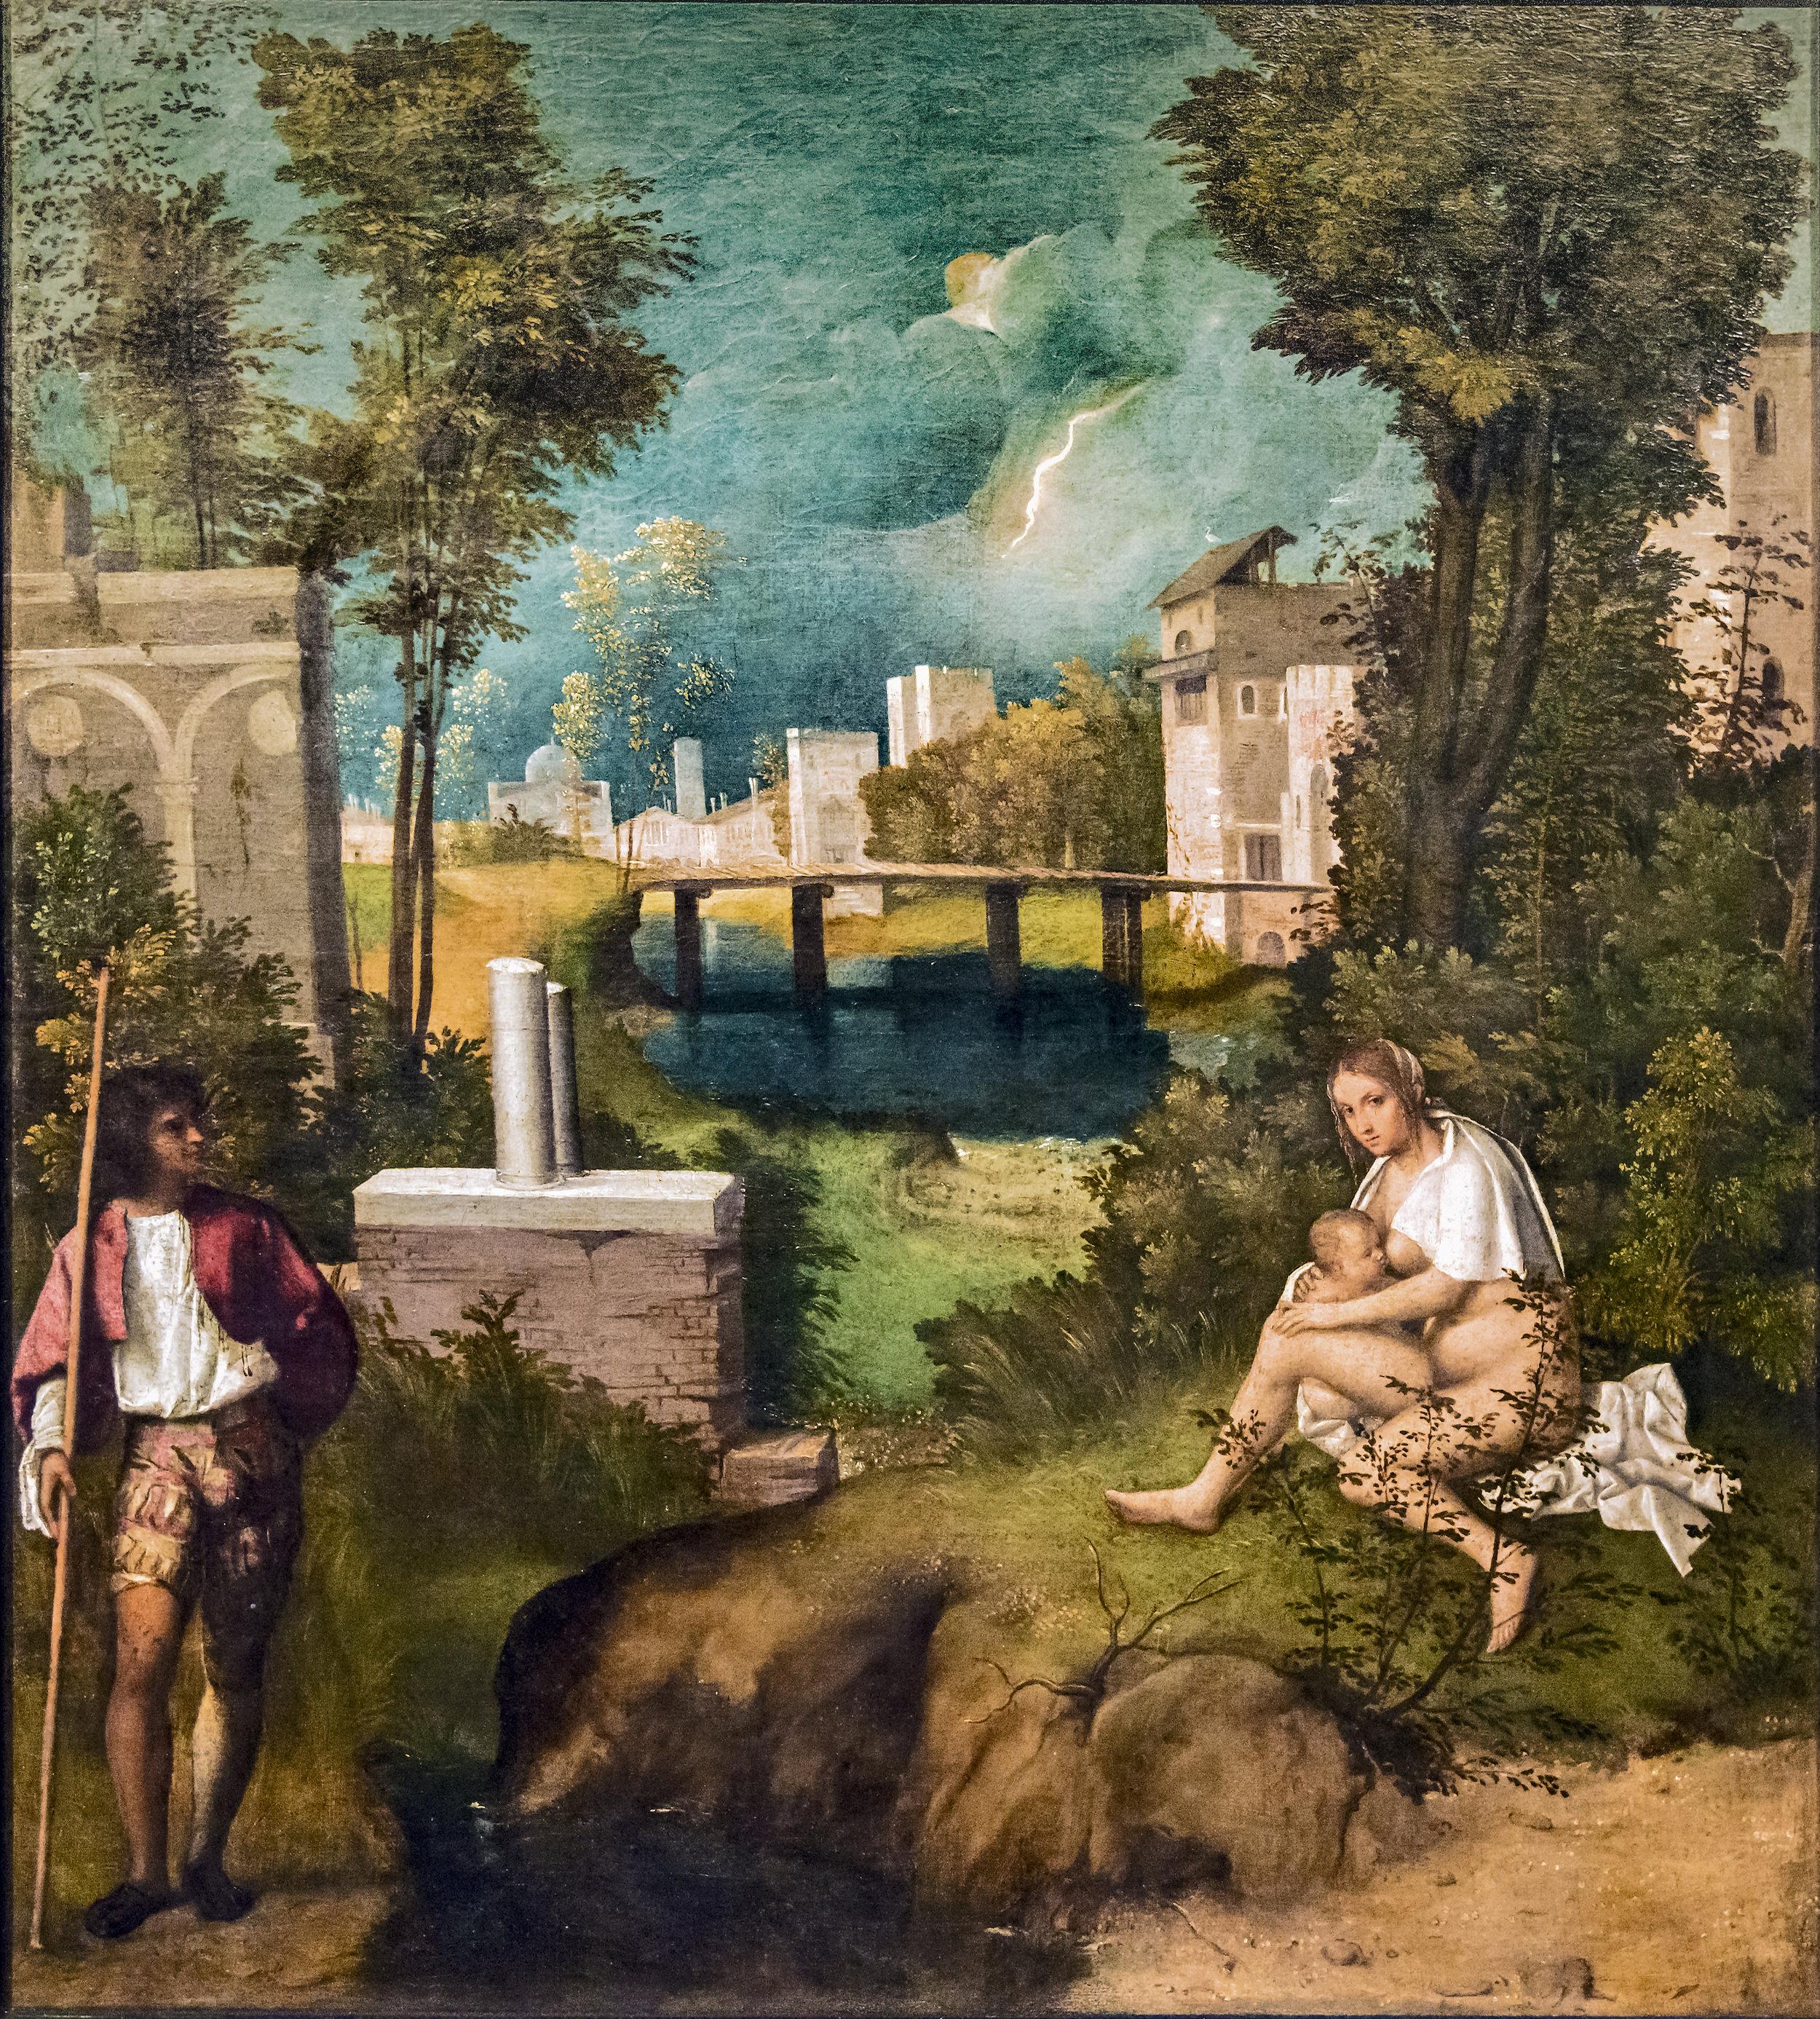 The Tempest by GIORGIONE  circa 1505   Gallerie dell'Accademia  Collection